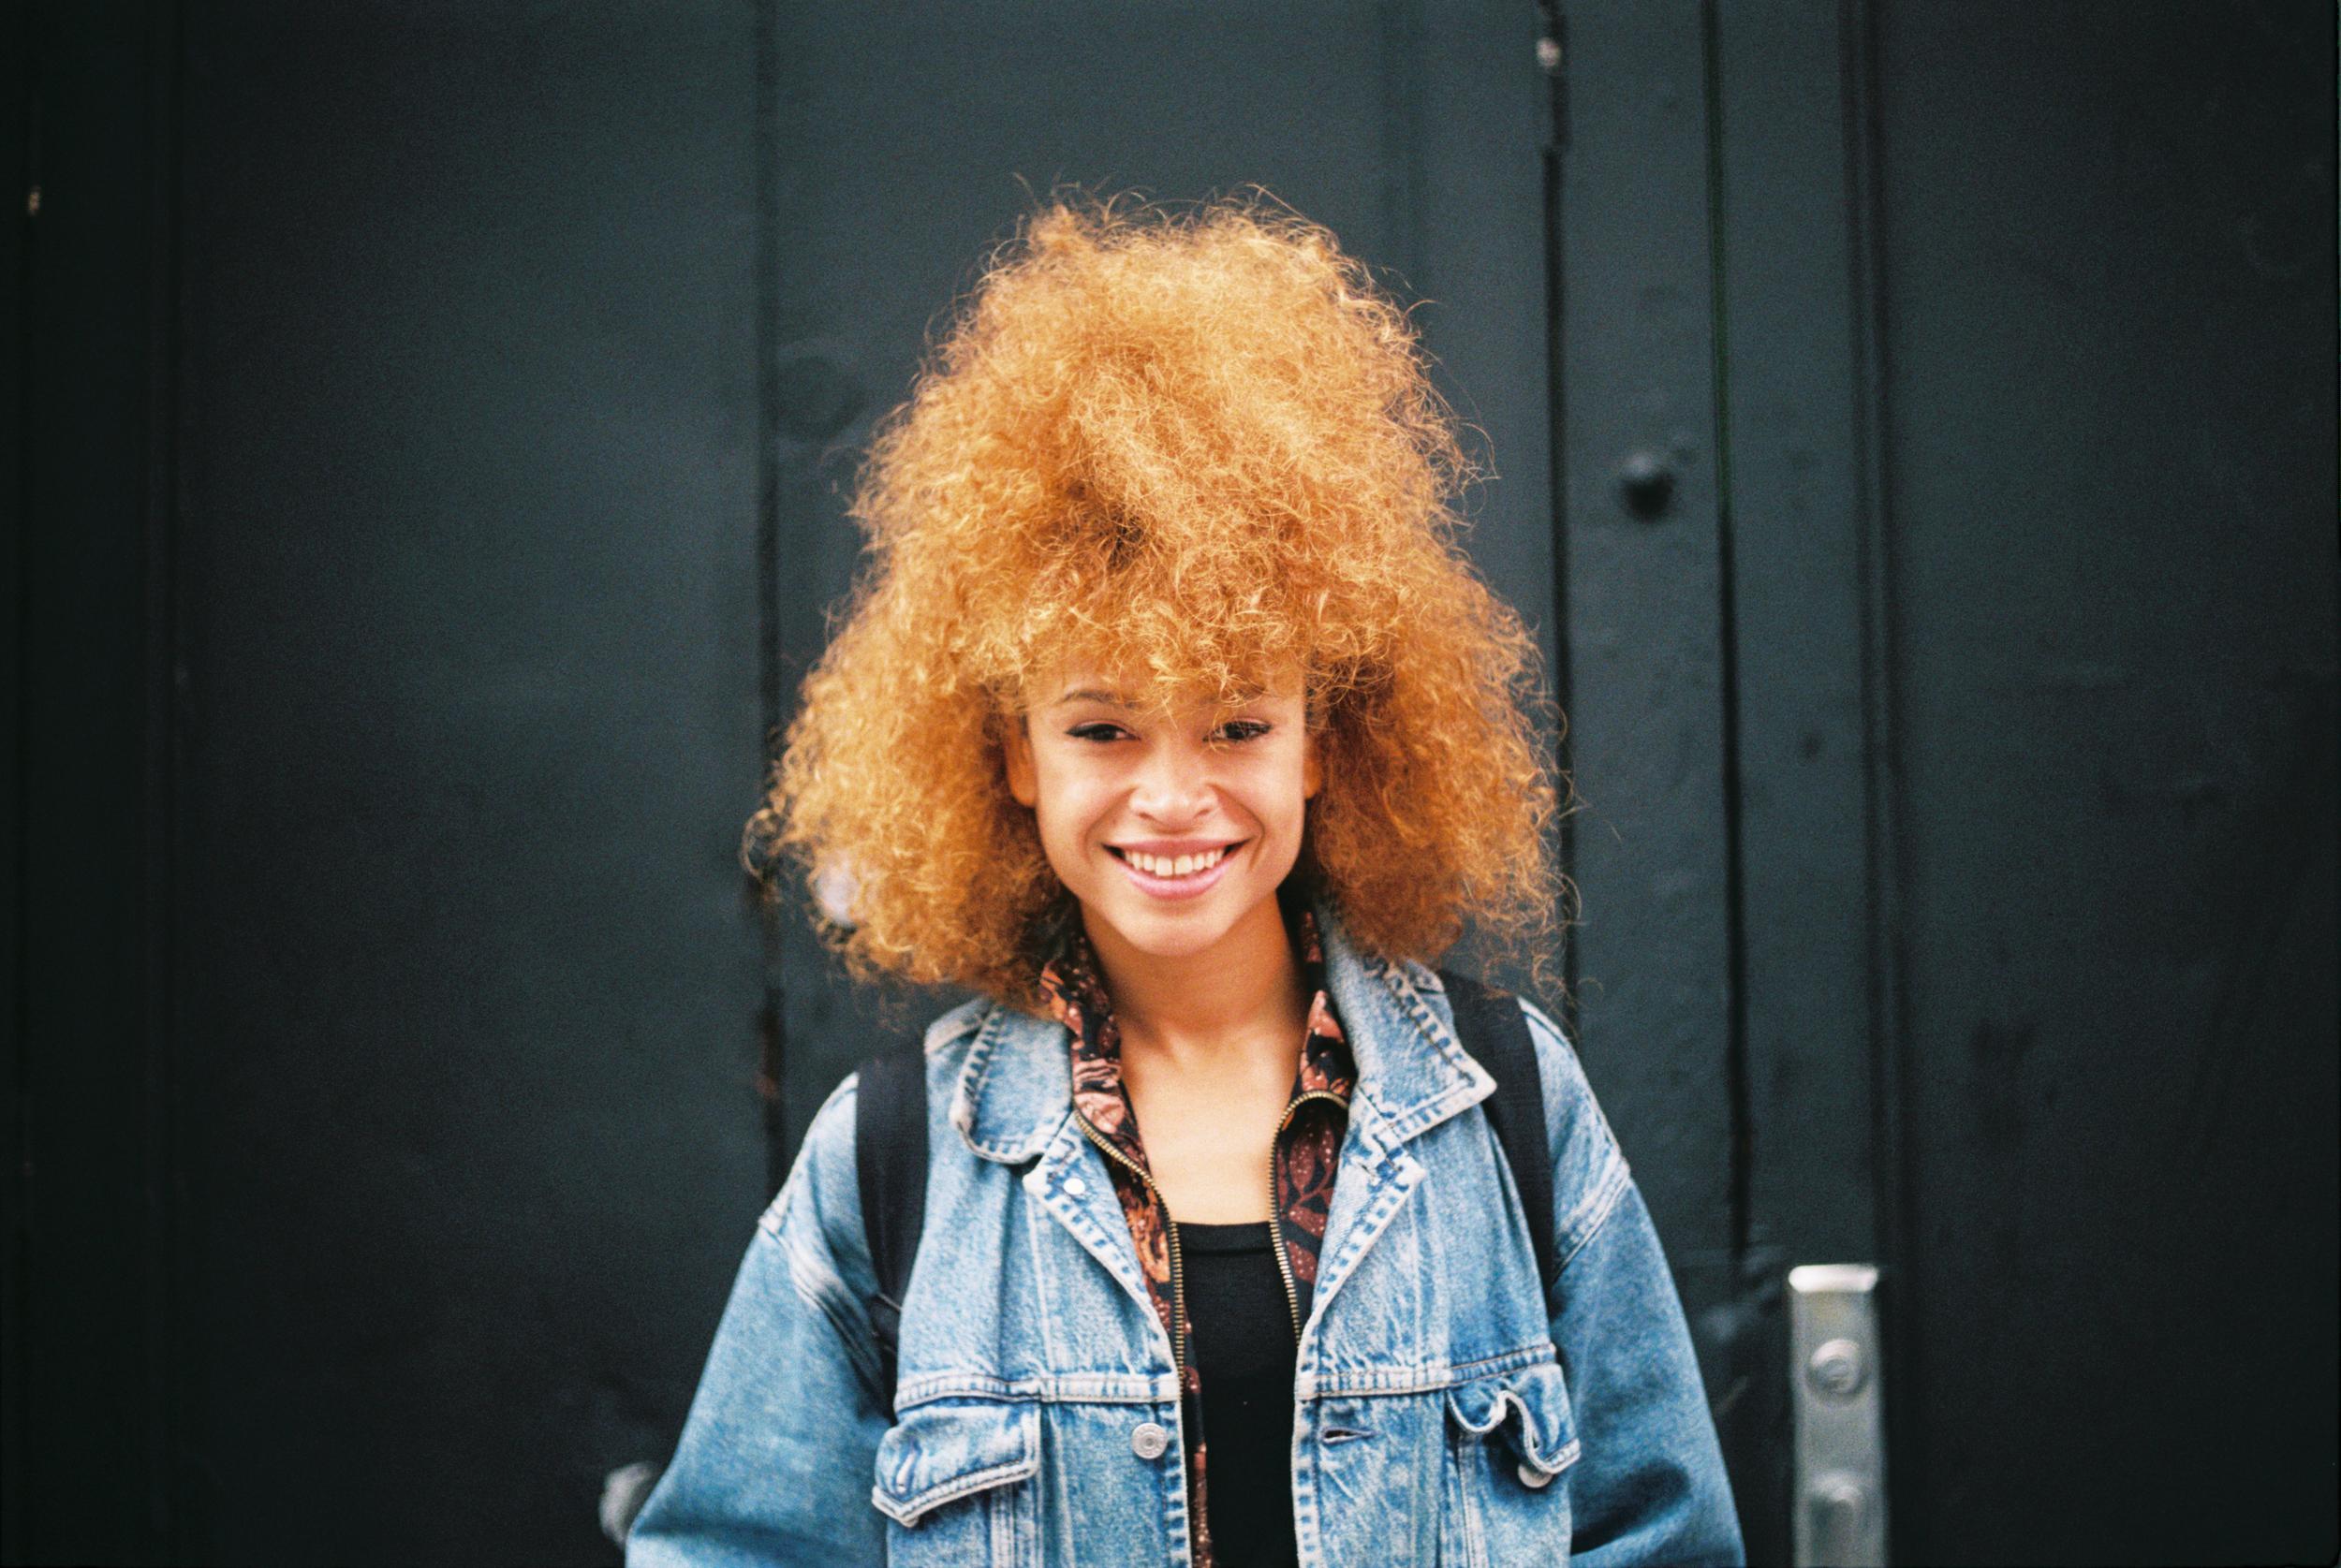 Curls. NYC